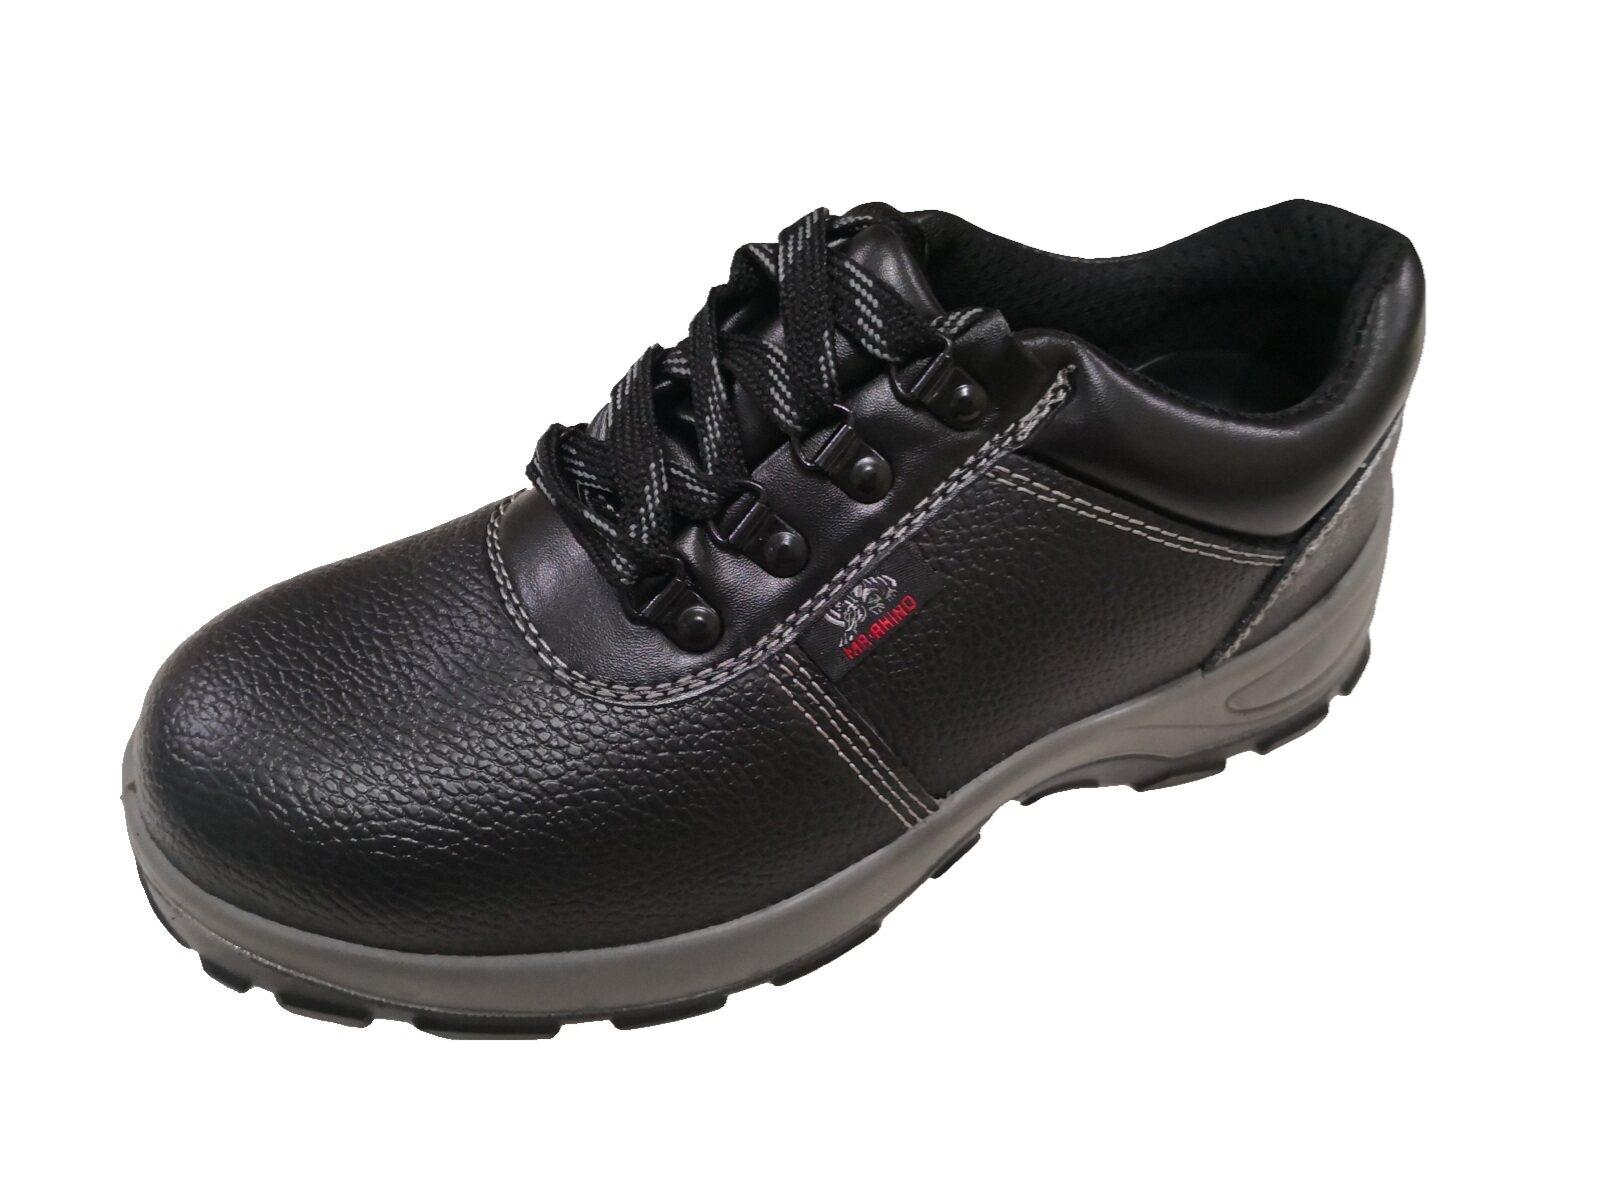 17bdbc624b4 Steel Toe Cap Safety Shoes / SAFETY BOOTS - MR RHINO RPU3100